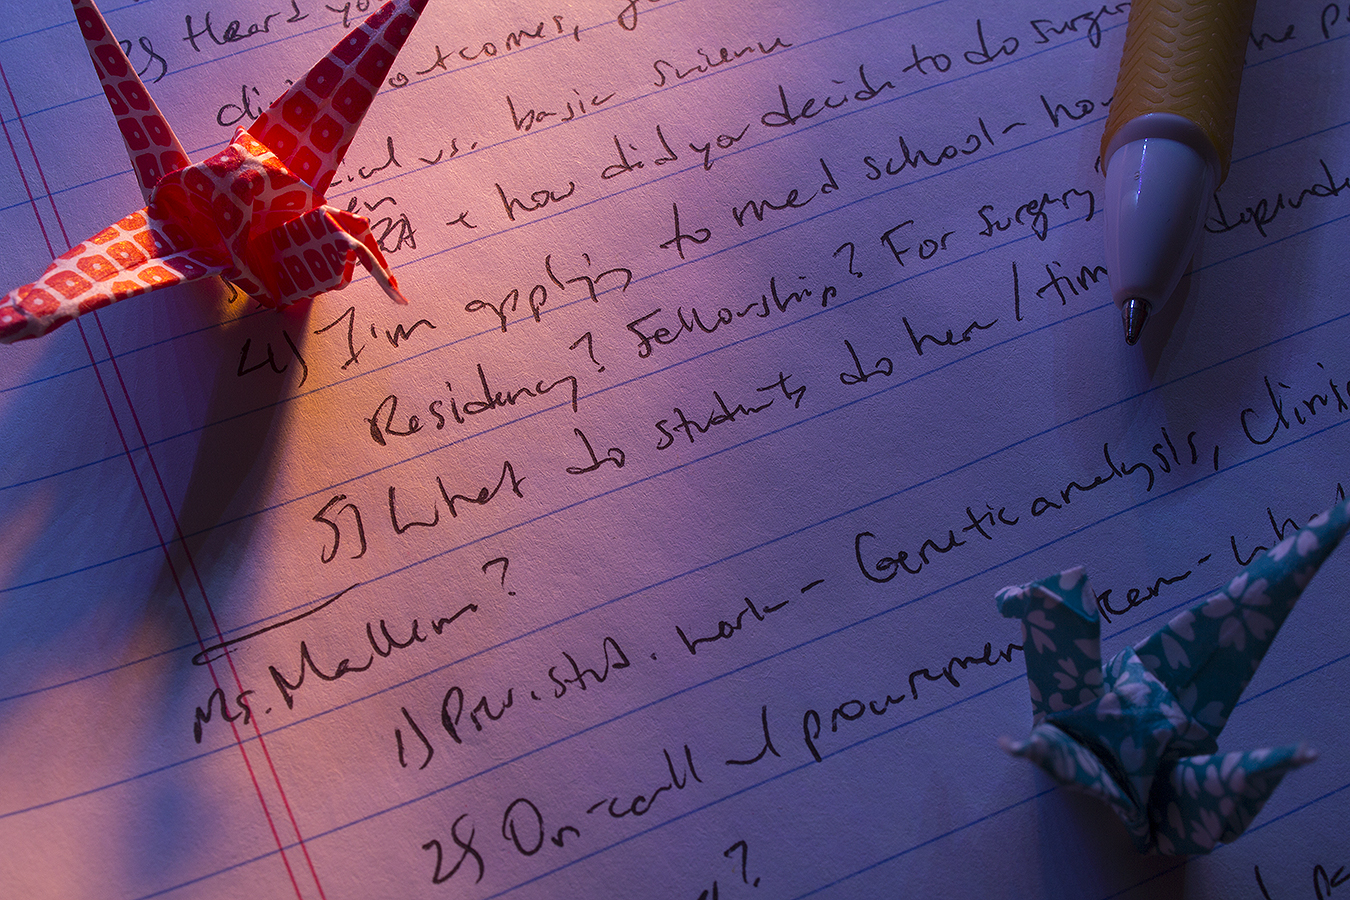 8_Note_Jonathan_Tang_UPenn_Tony_Ward_Studio_Long_Exposure_Low_Light_LED_Optics_Origami_Paper